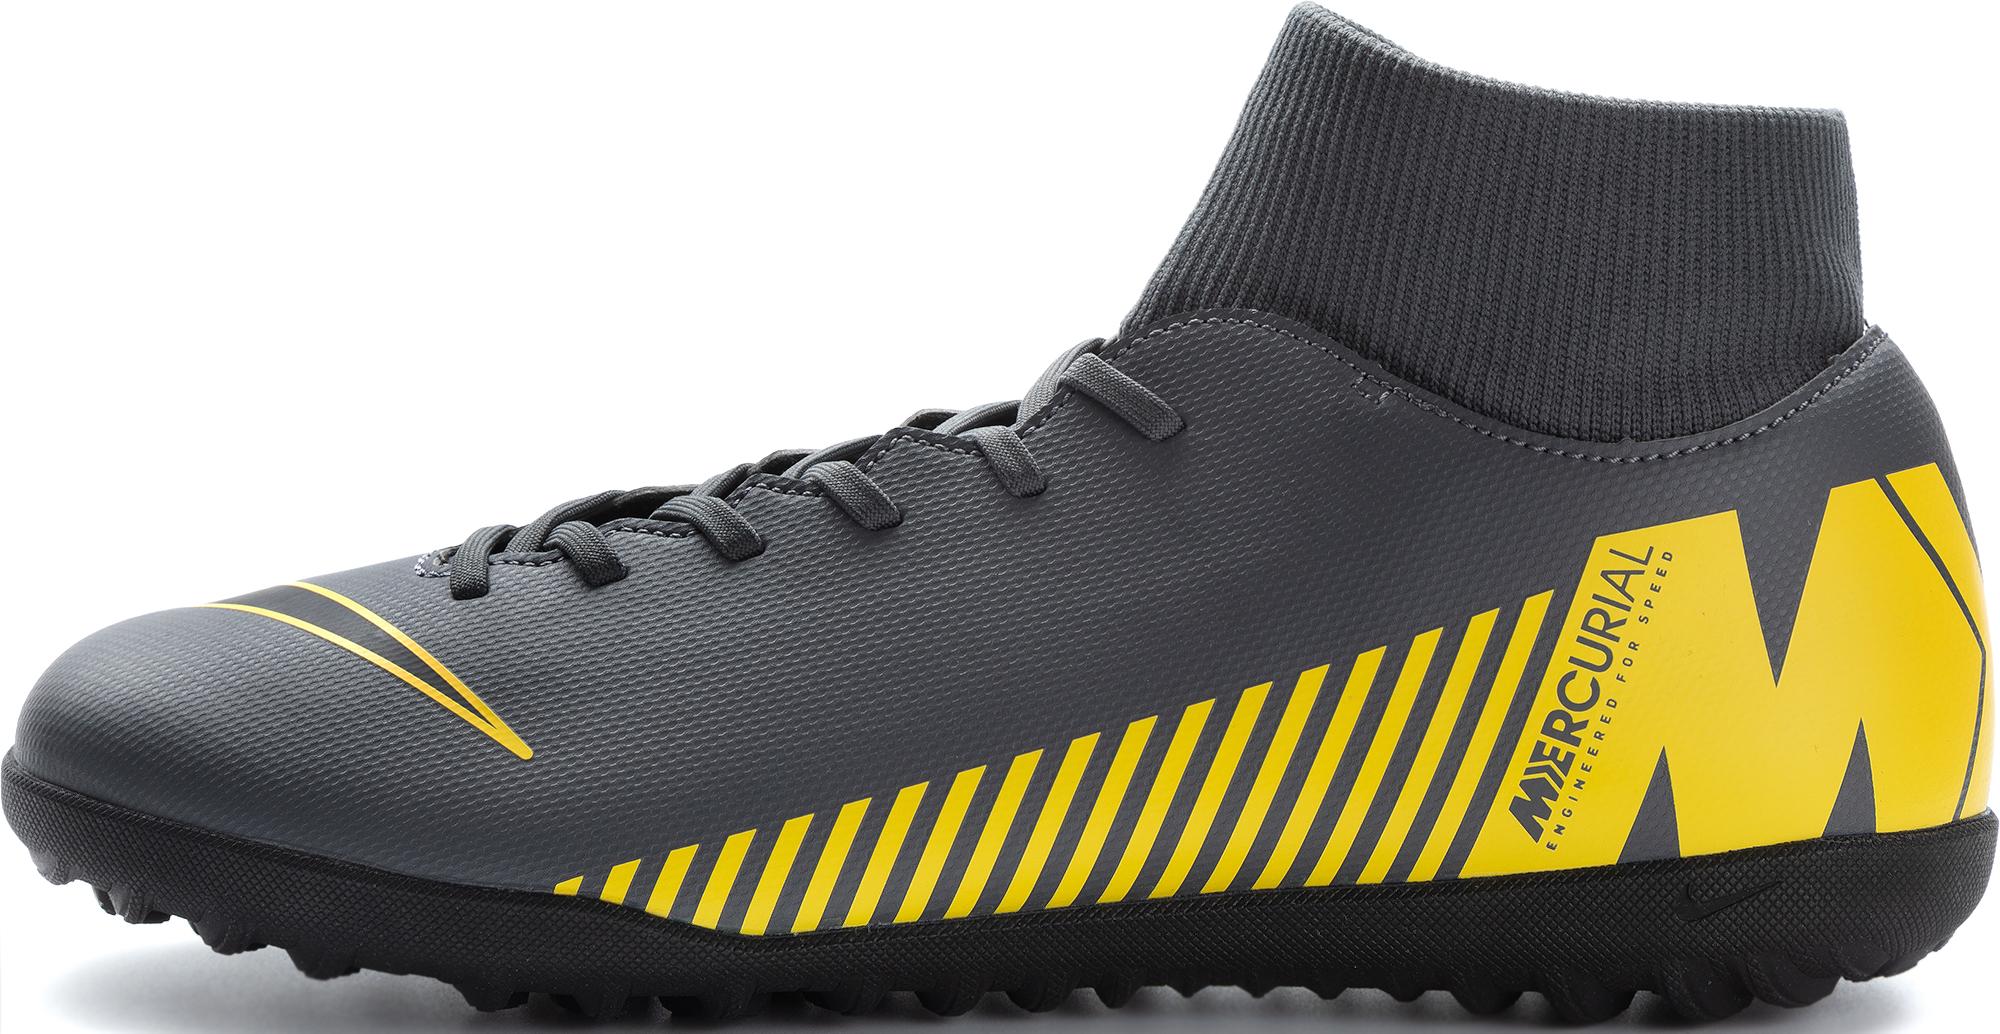 Nike Бутсы мужские Nike Superfly 6 Club TF, размер 45